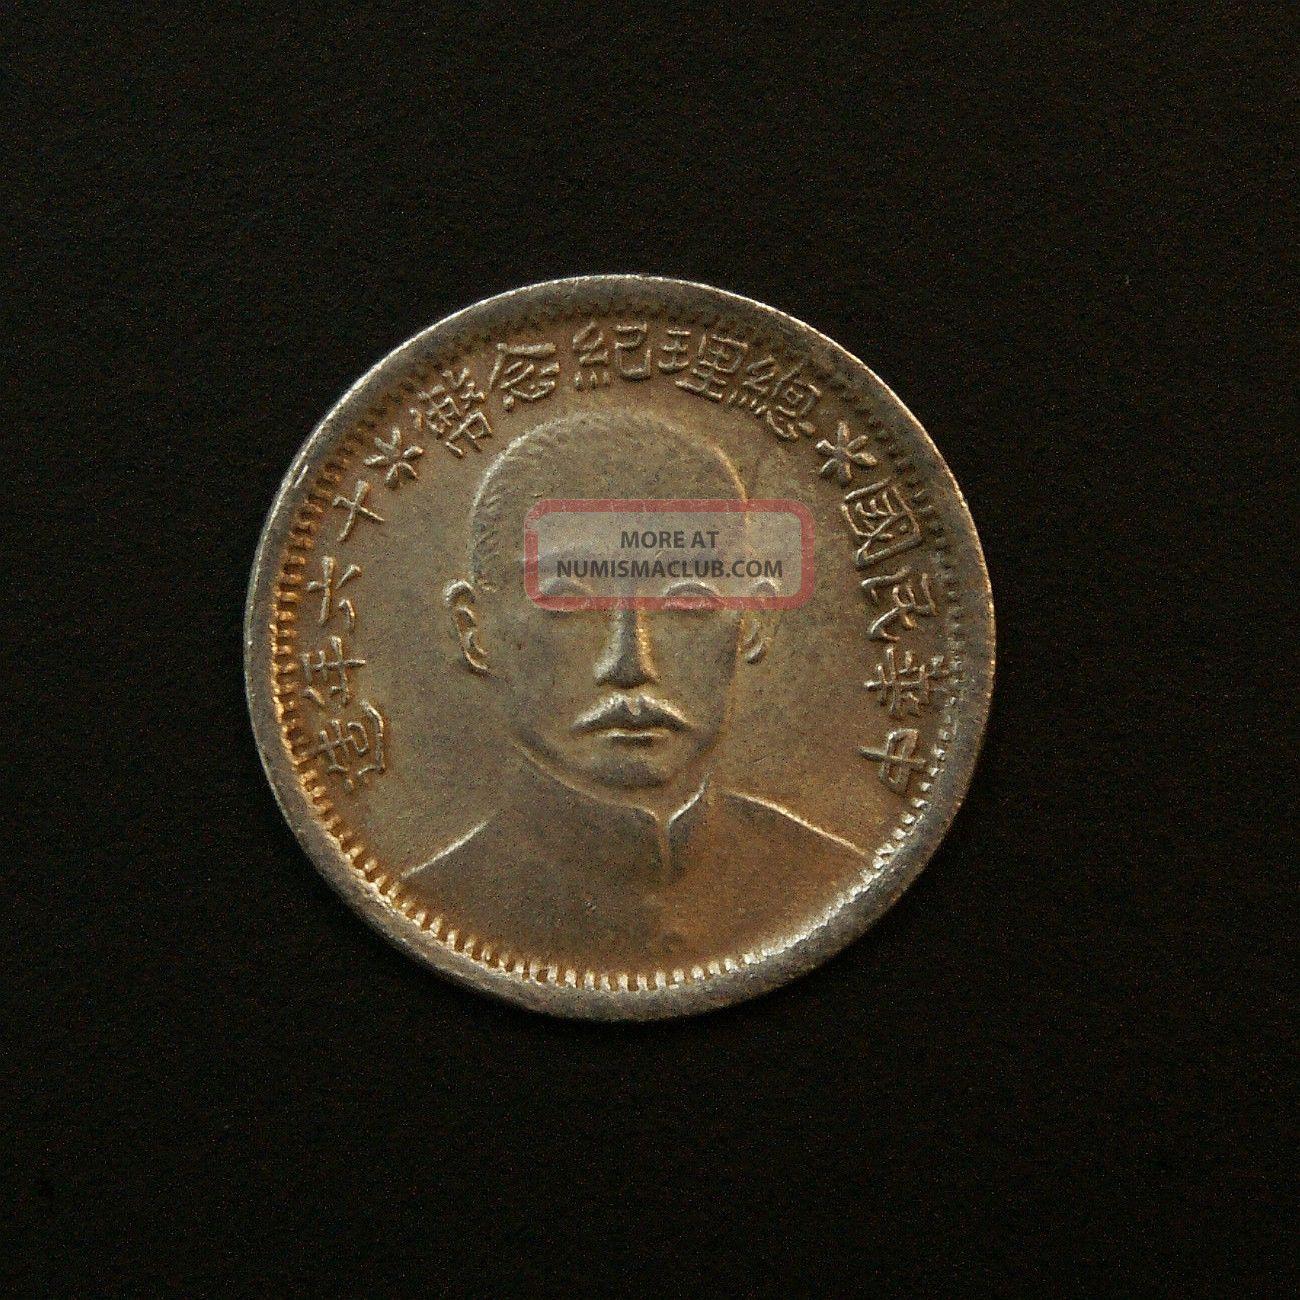 Rare Vintage China 1927 Year16 Silver Sun Yat - Sen Prime Minister Memorial Coin China photo